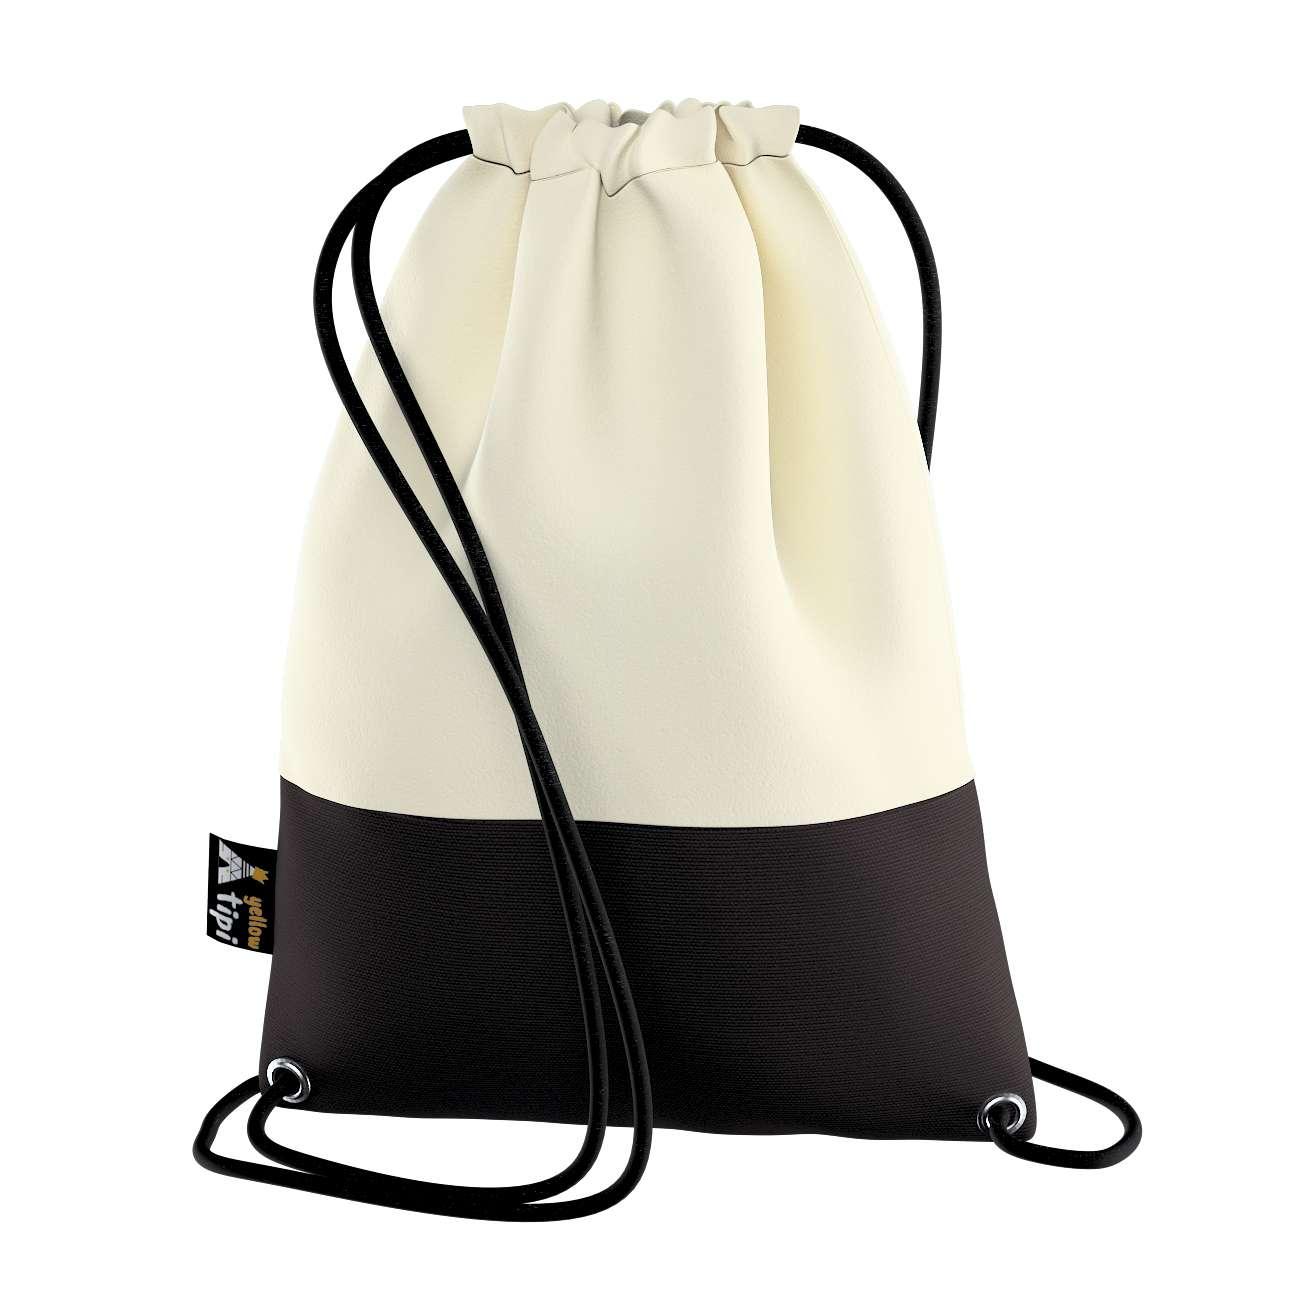 Kiddy Velvet krepšys kolekcijoje Posh Velvet, audinys: 704-10